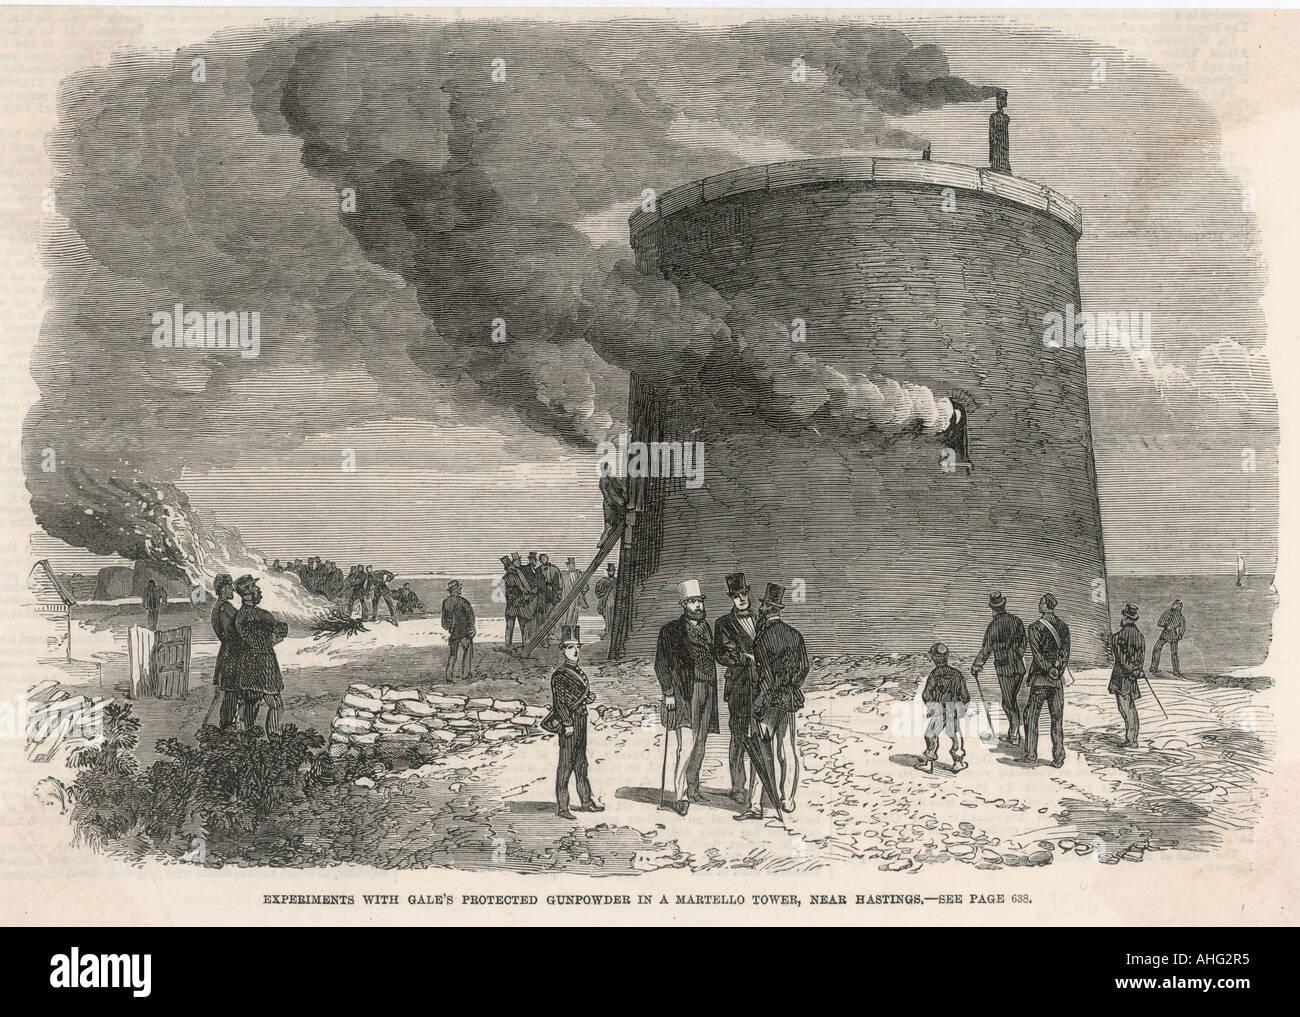 Testing Explosives 1866 - Stock Image